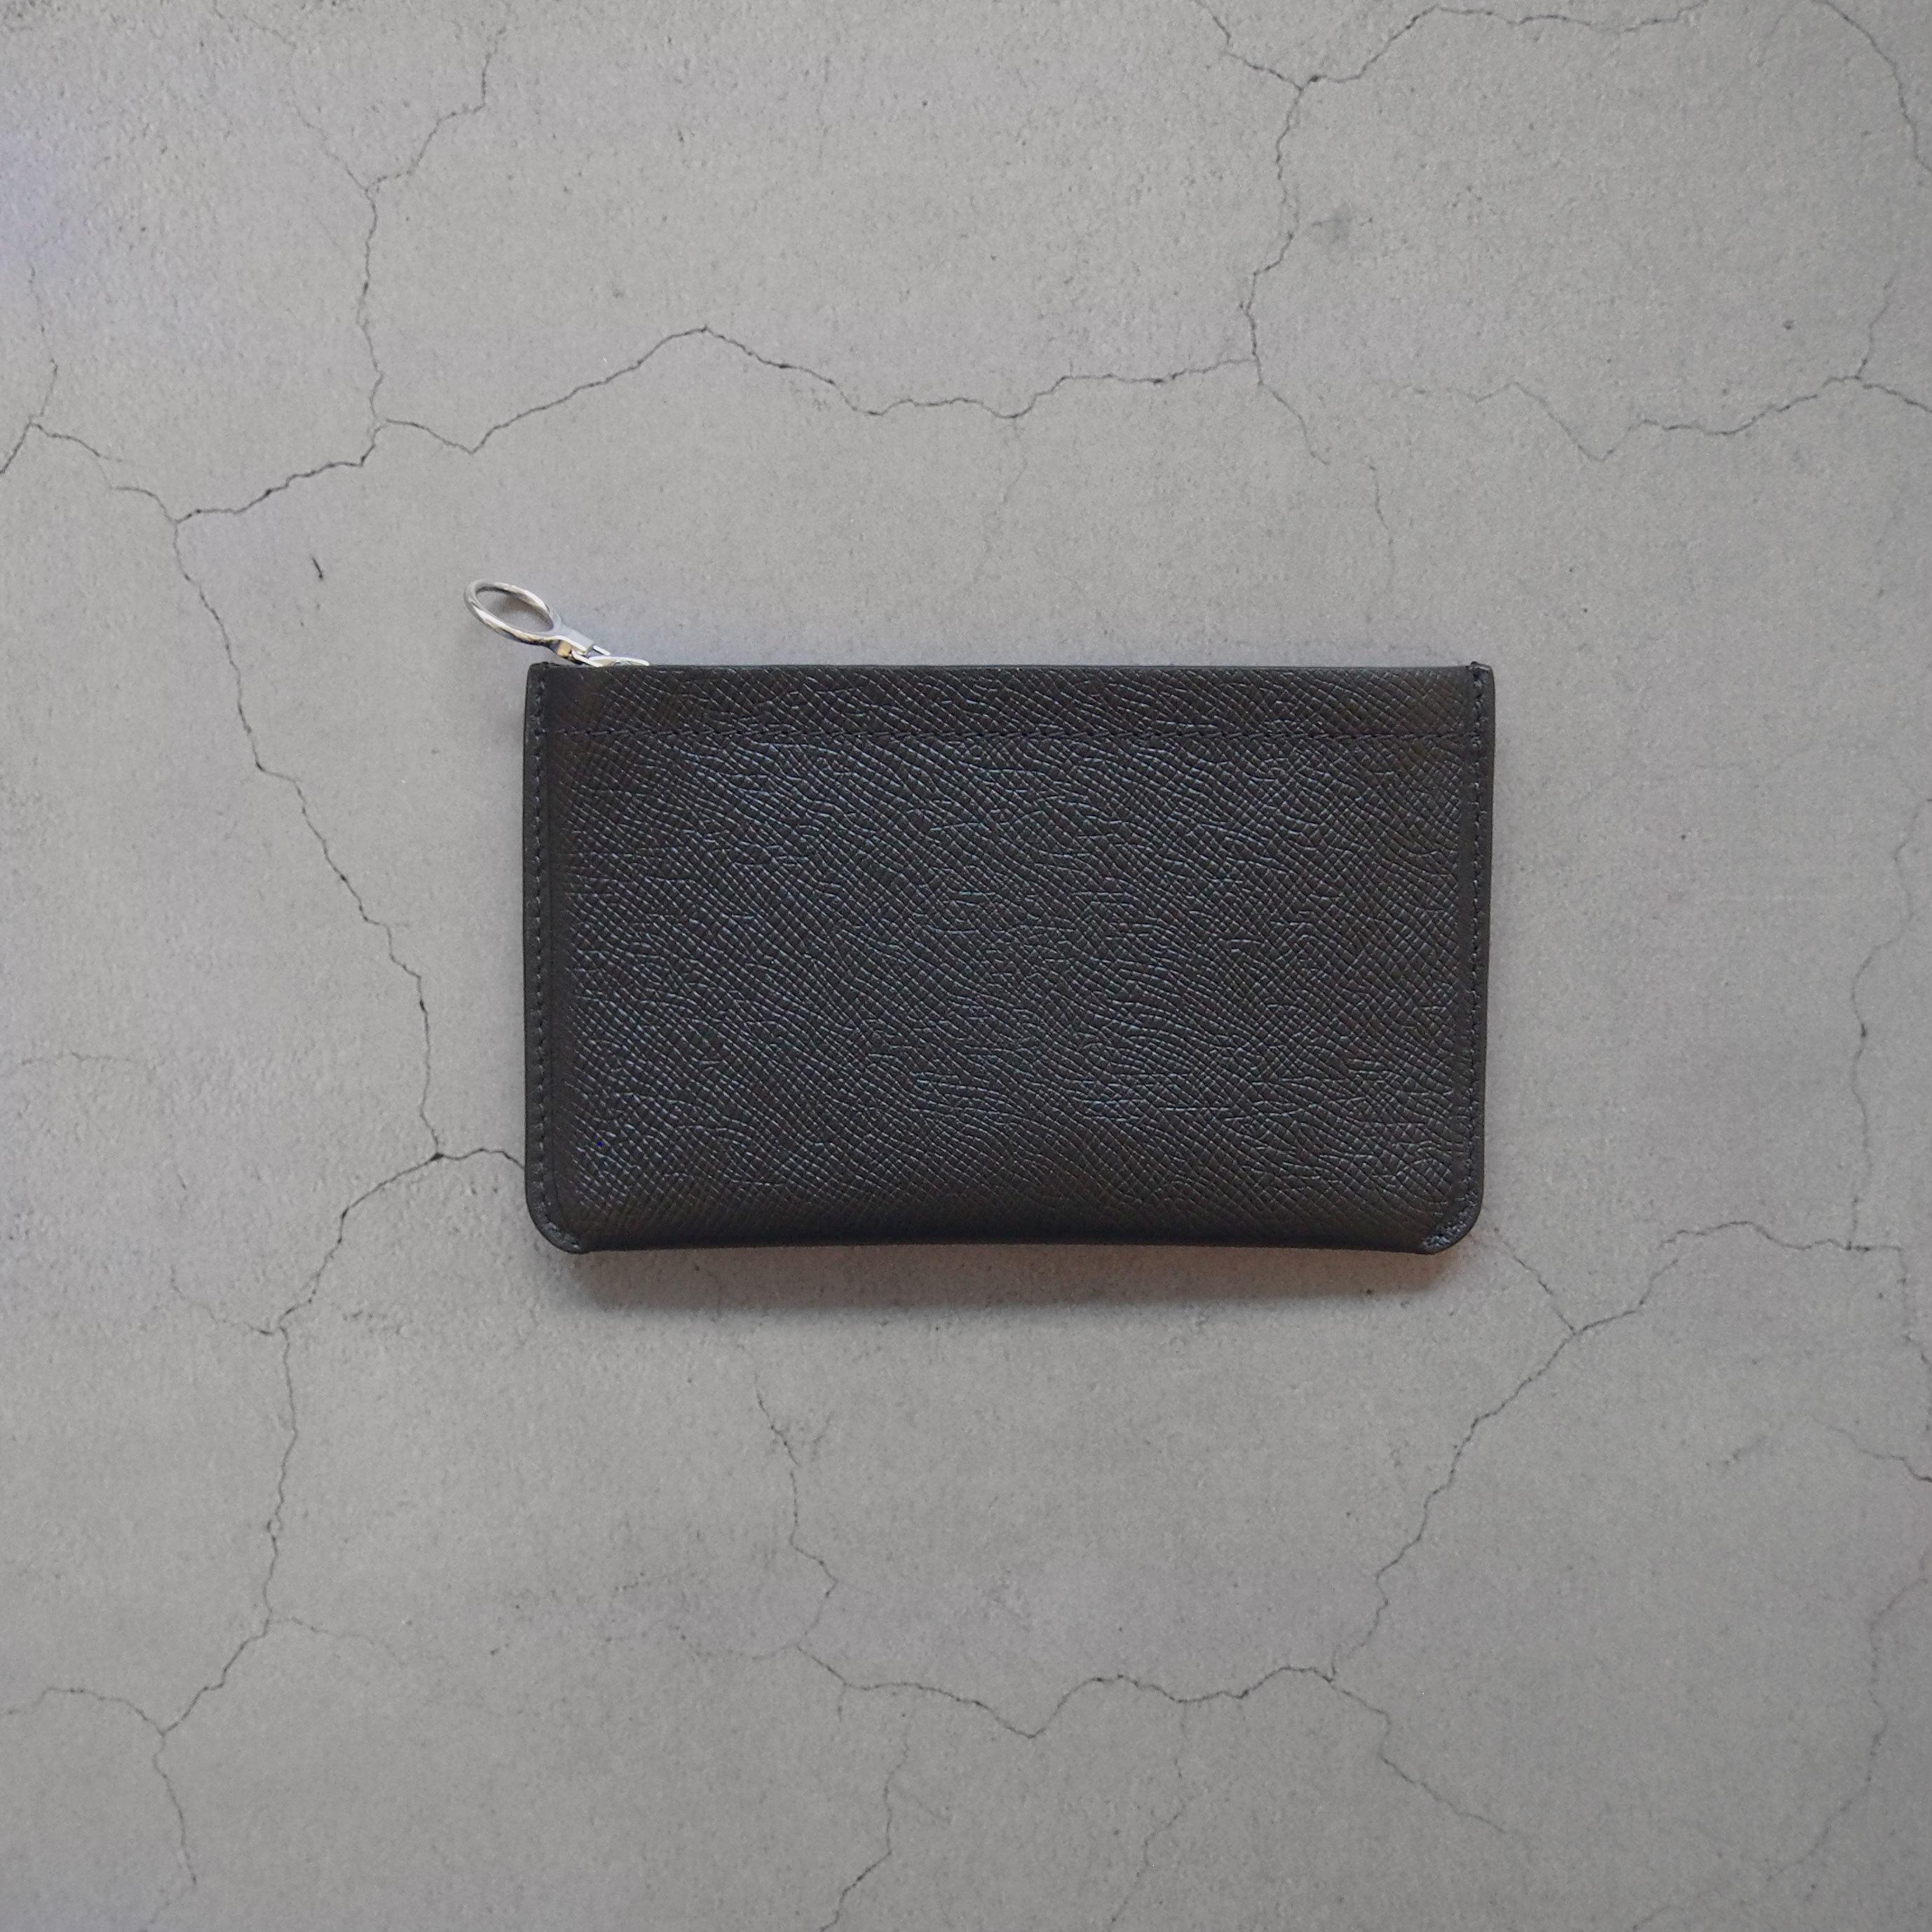 Aeta BI06 MINI WALLET BLACK/SILVER